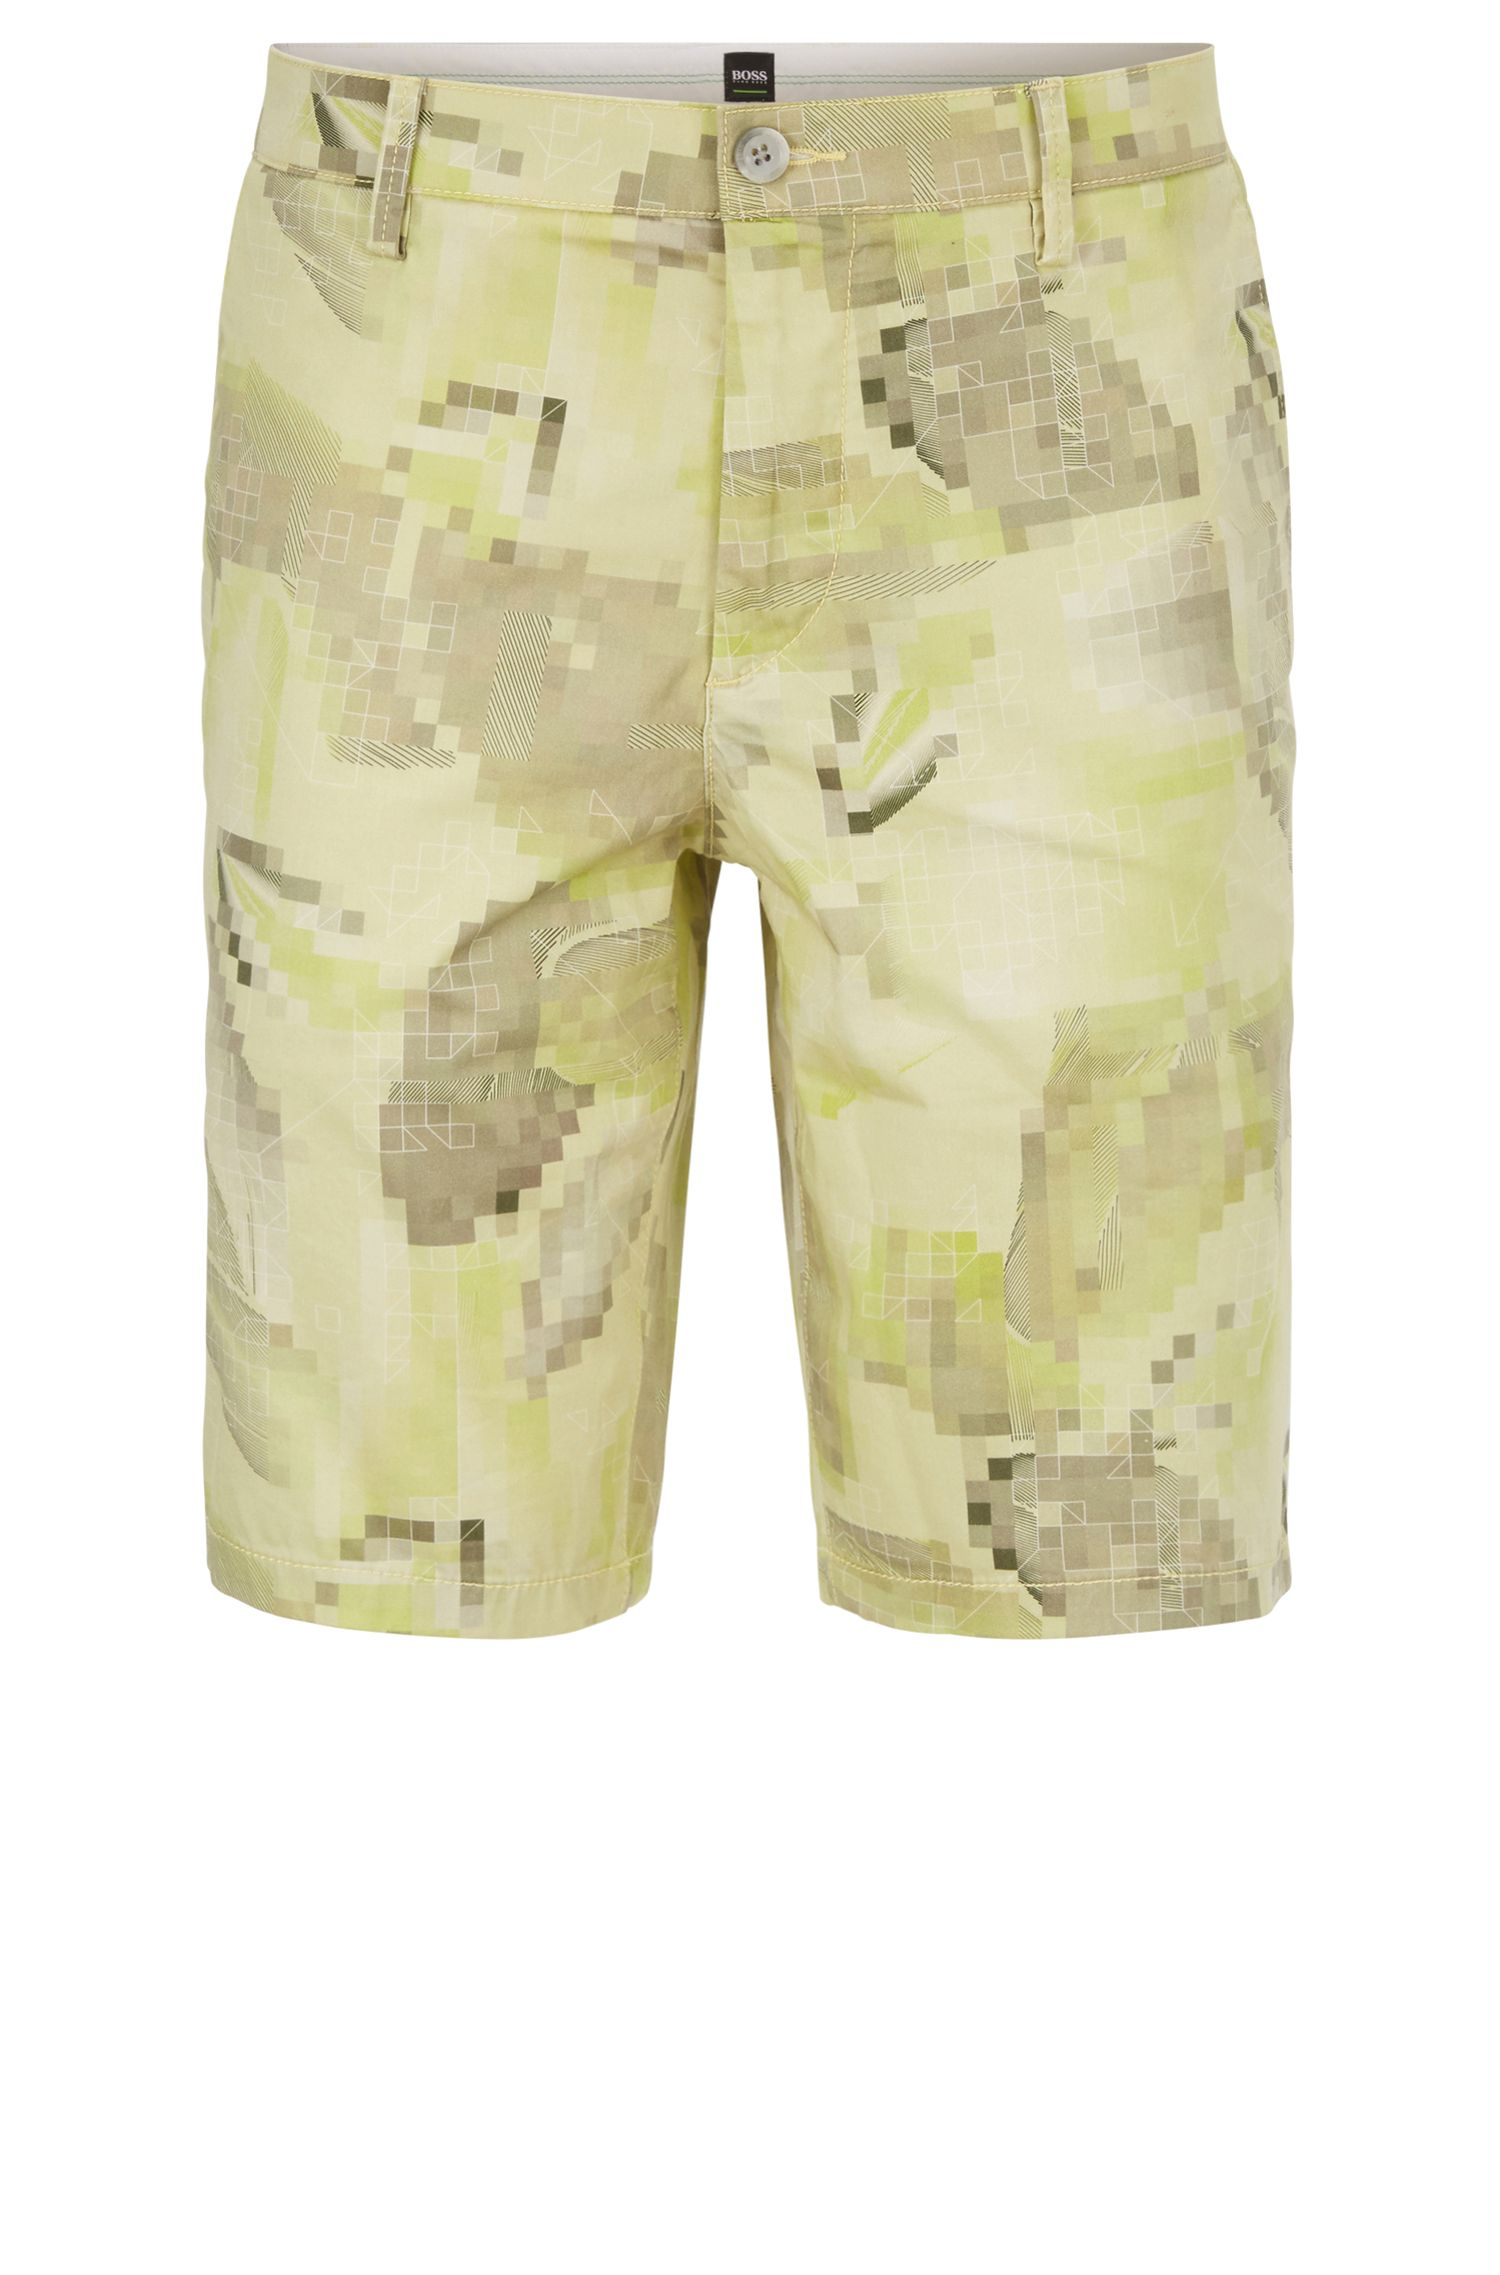 Digi-Camo Sateen Stretch Cotton Short, Slim Fit | Liem Print W